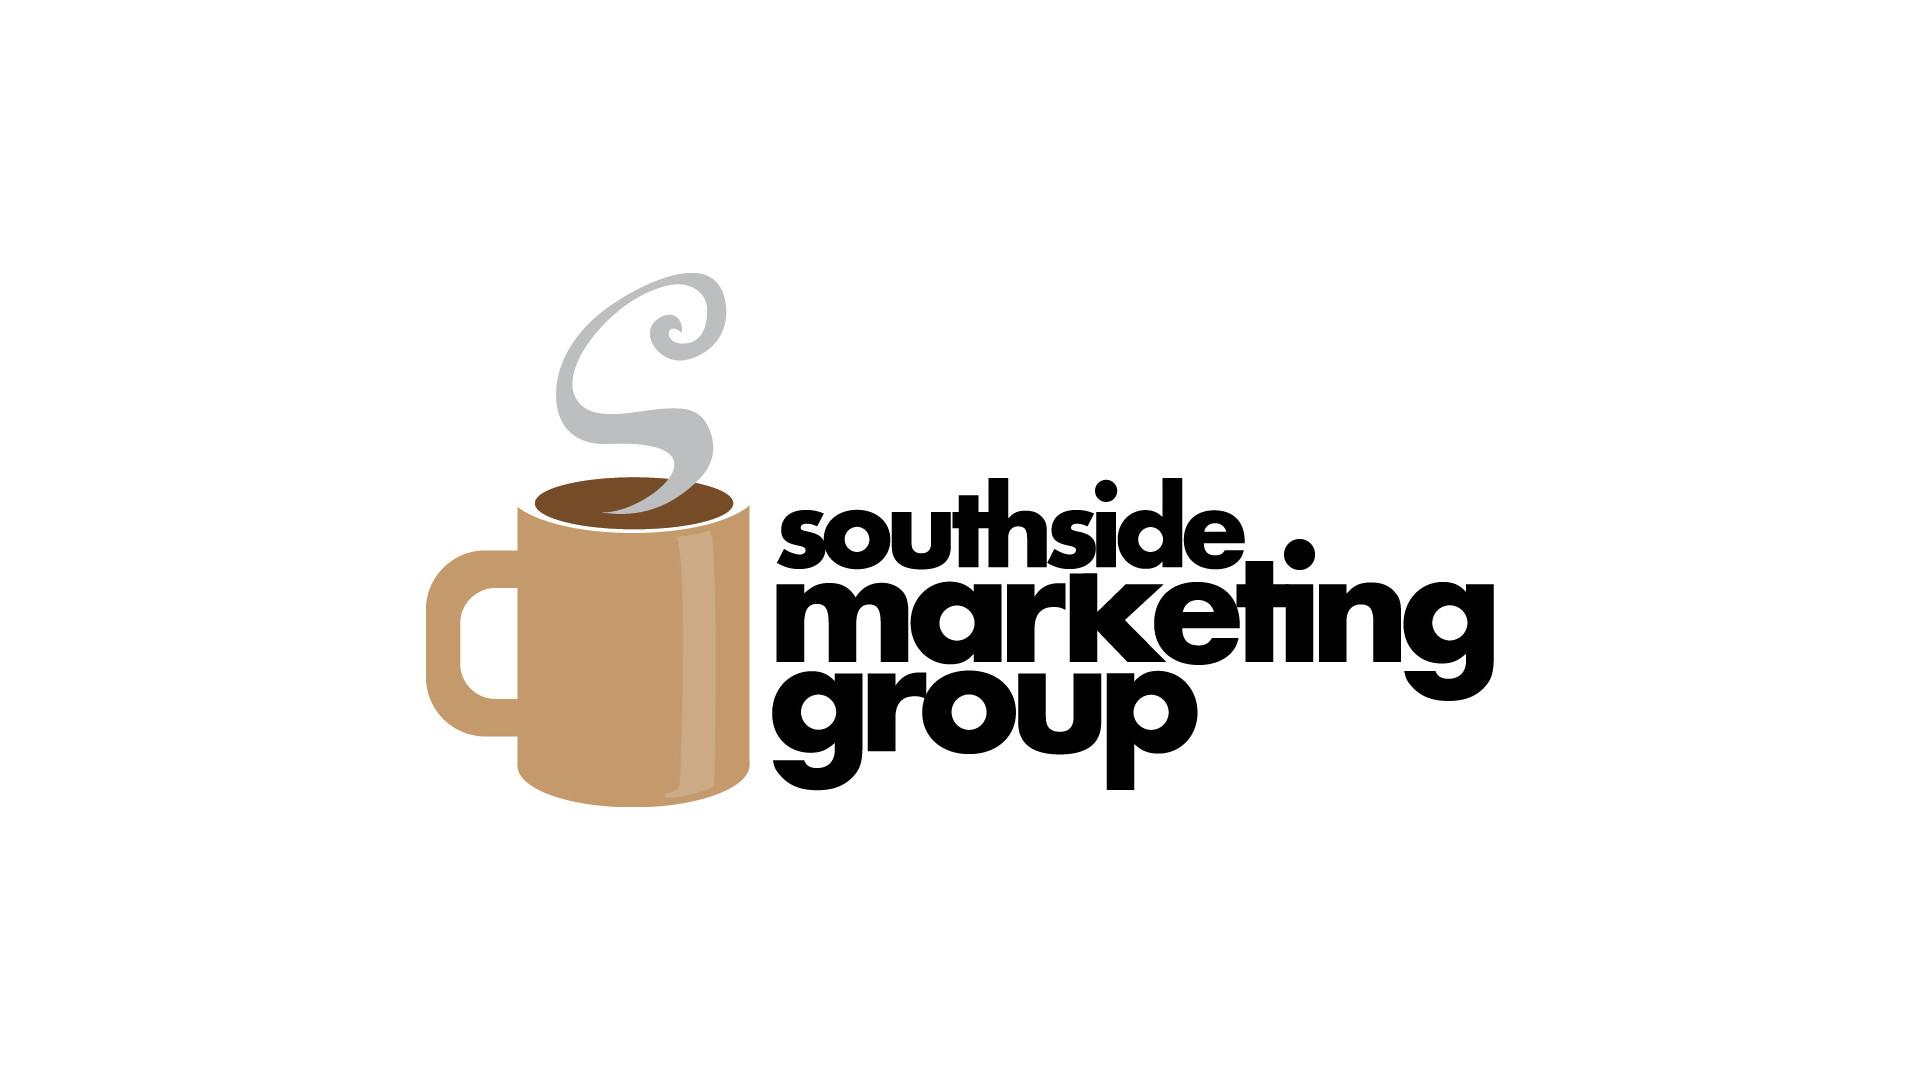 Southside Marketing Group